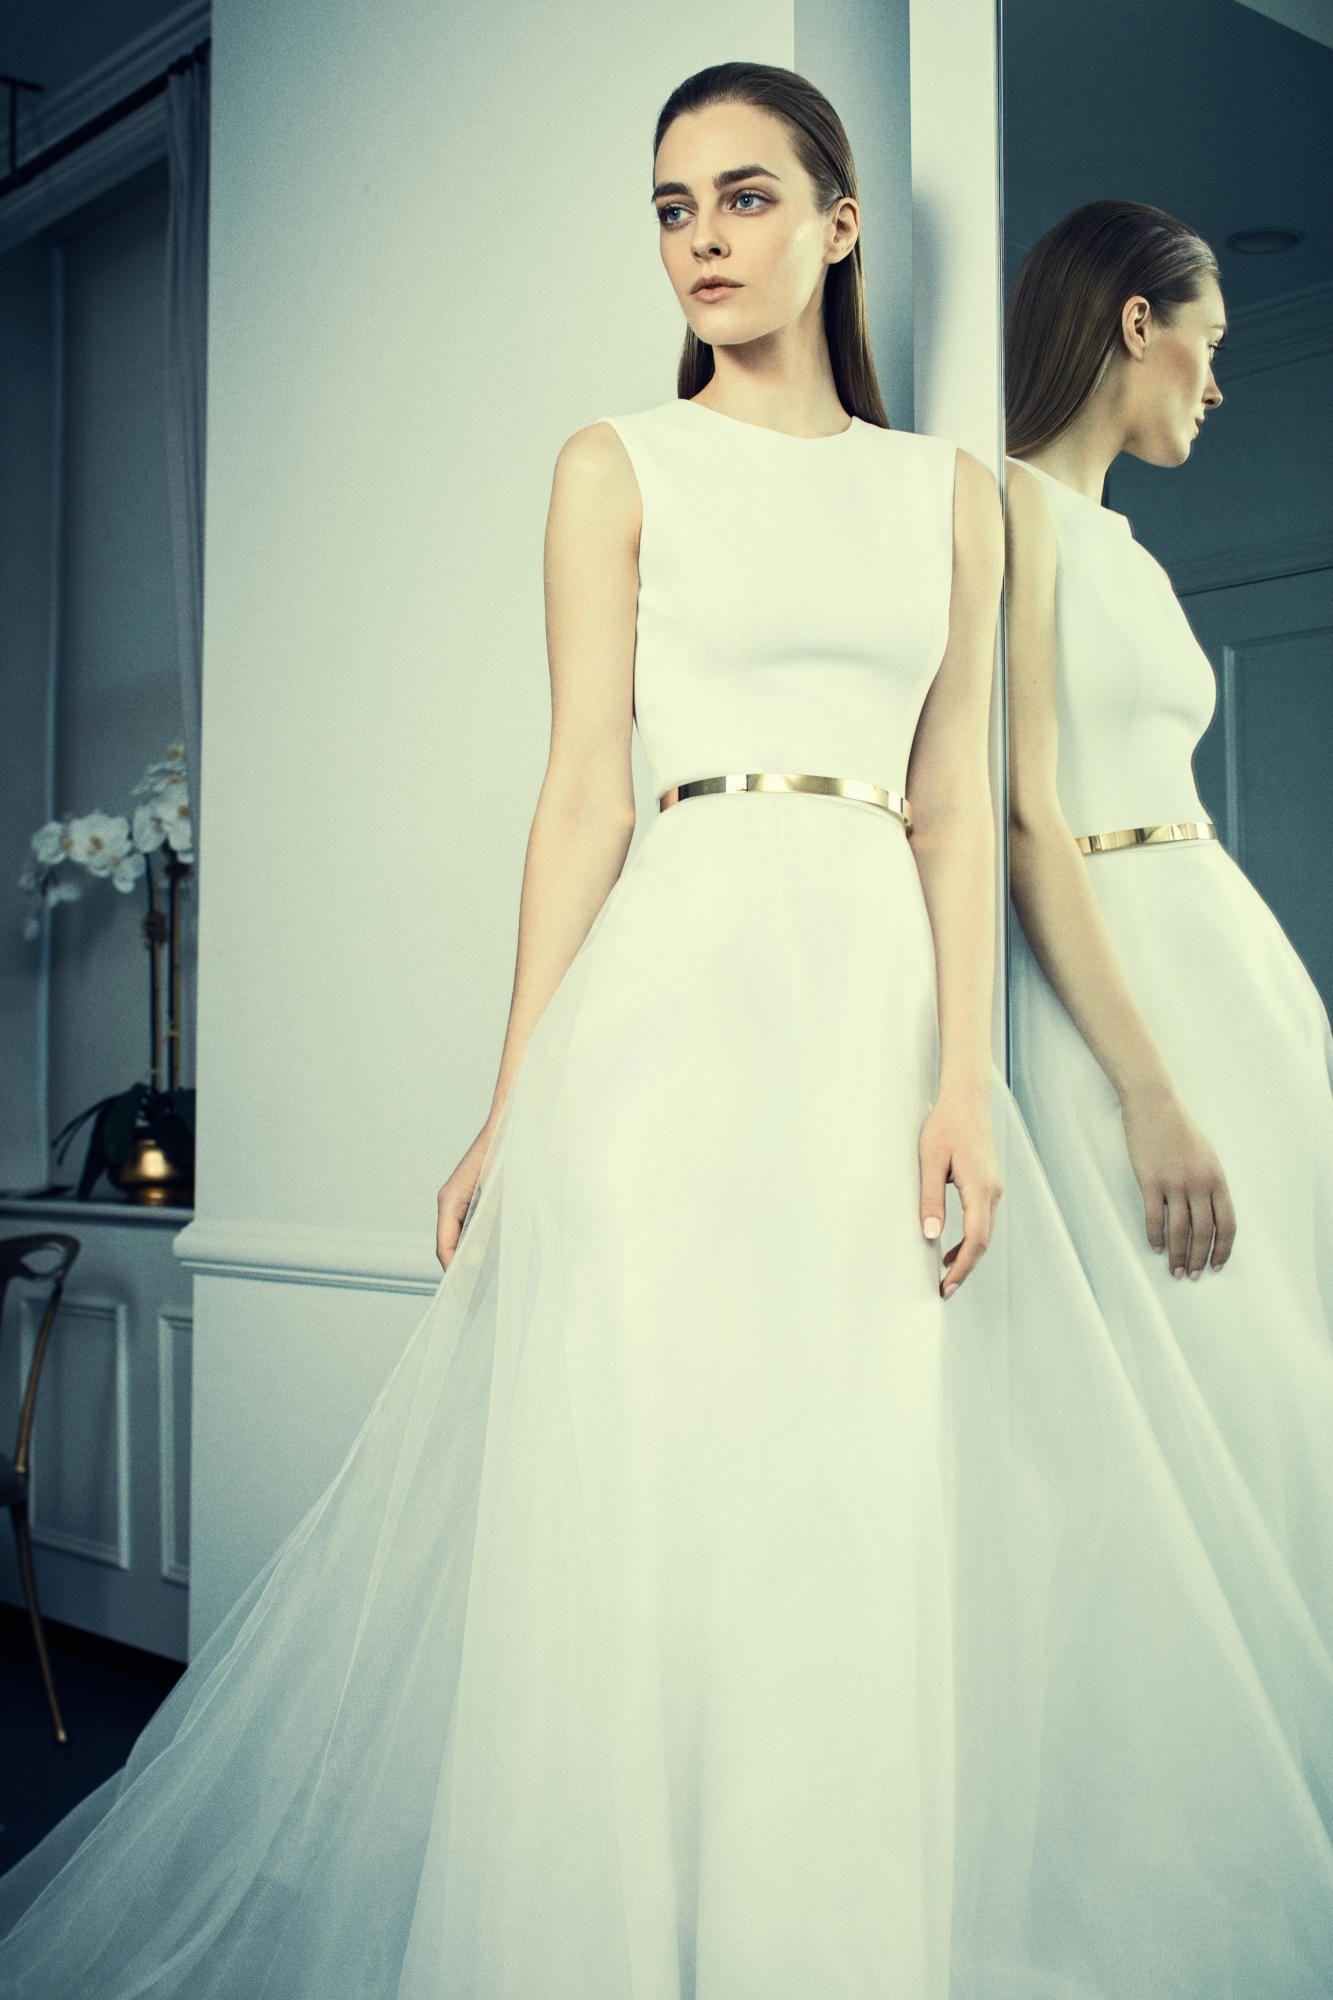 romona-keveza-spring-2018-bridal-gold-belt Tendências de vestidos de noiva para 2018